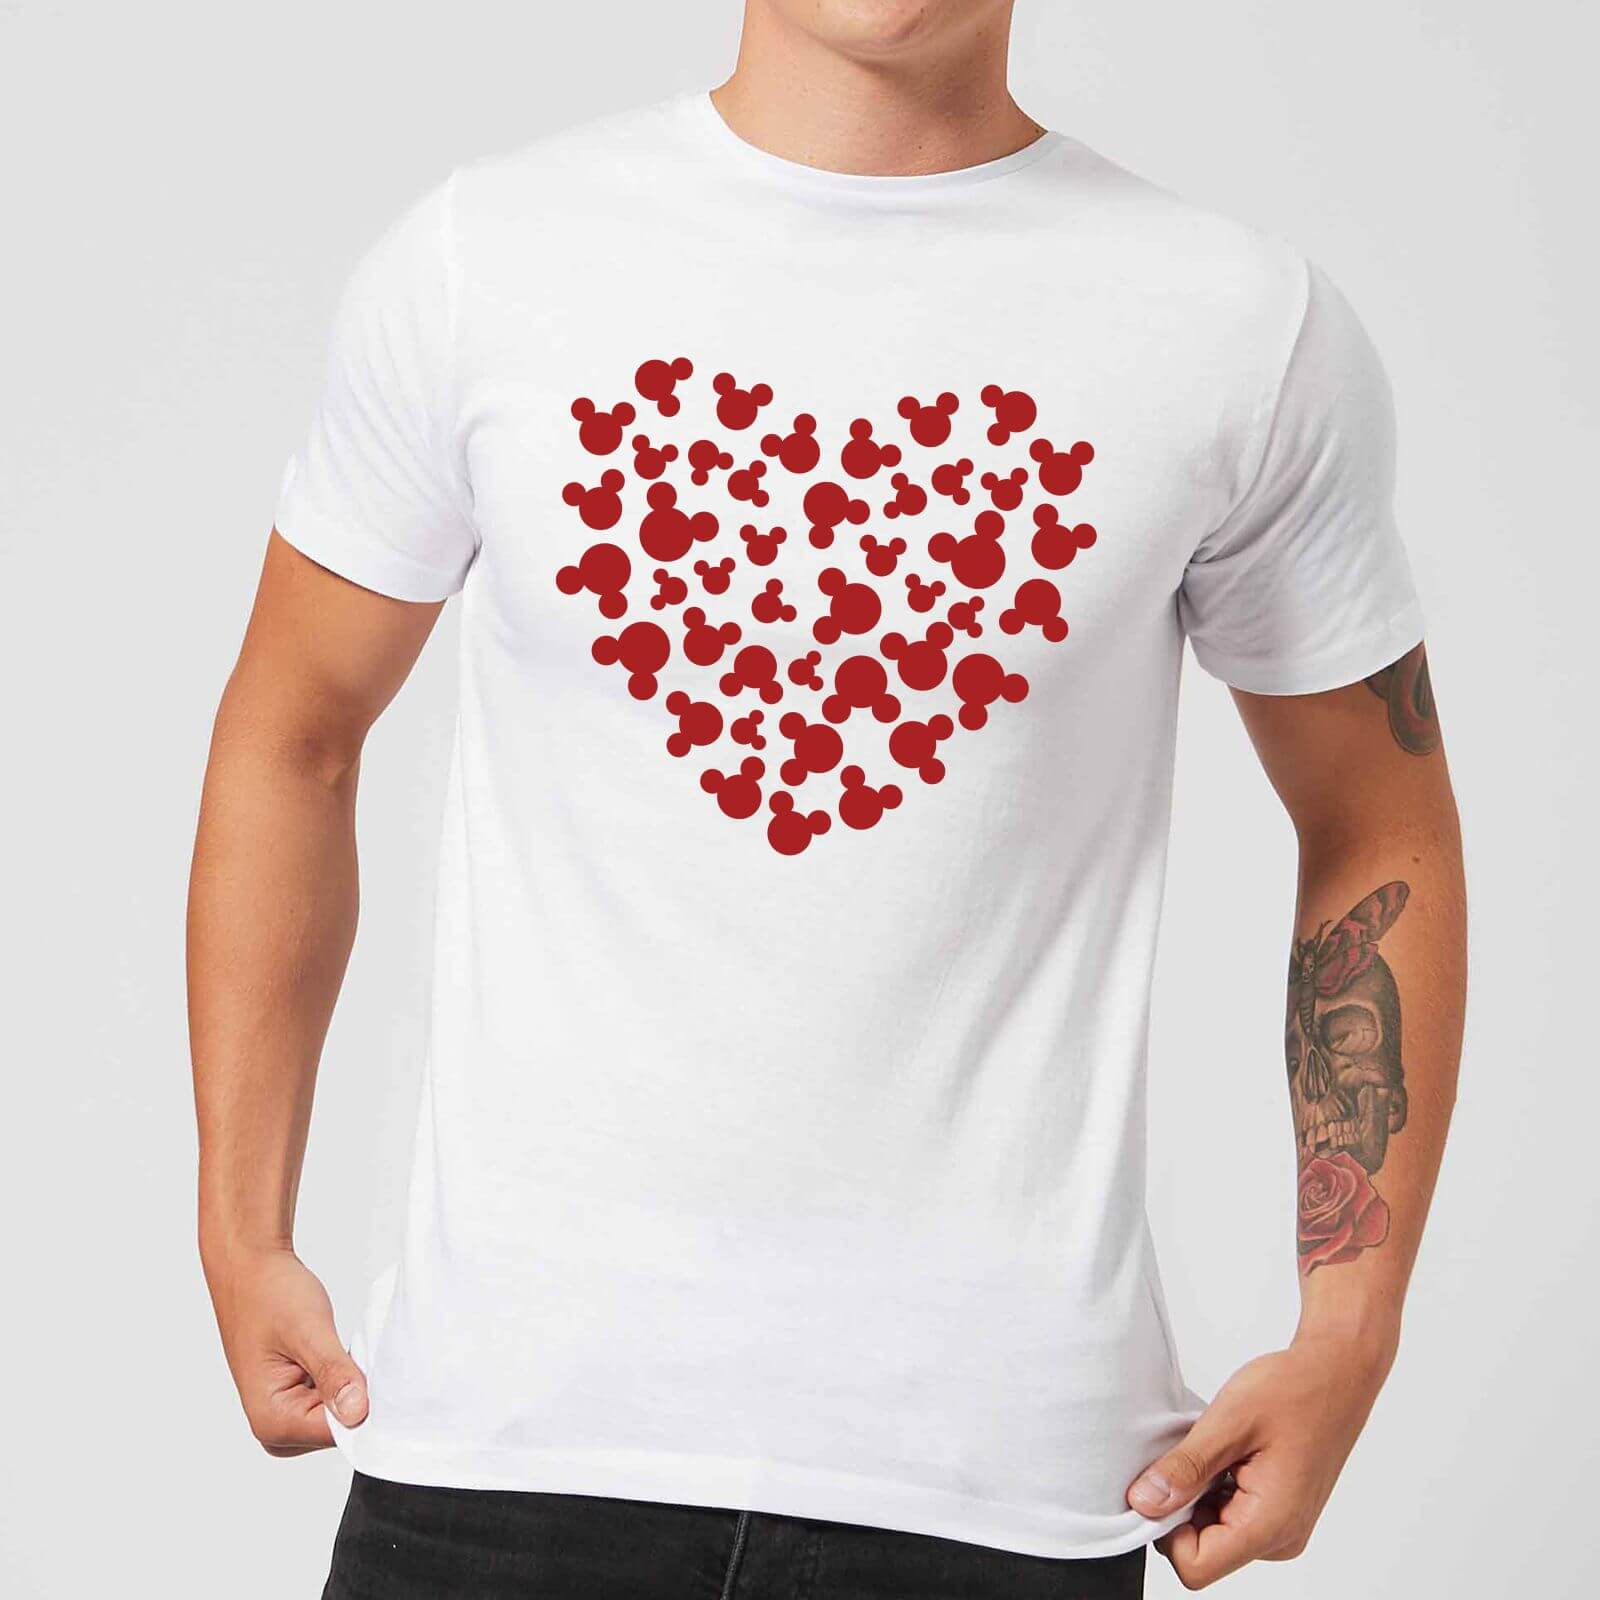 Disney Disney Mickey Mouse Heart Silhouette T-Shirt - White - 4XL - White